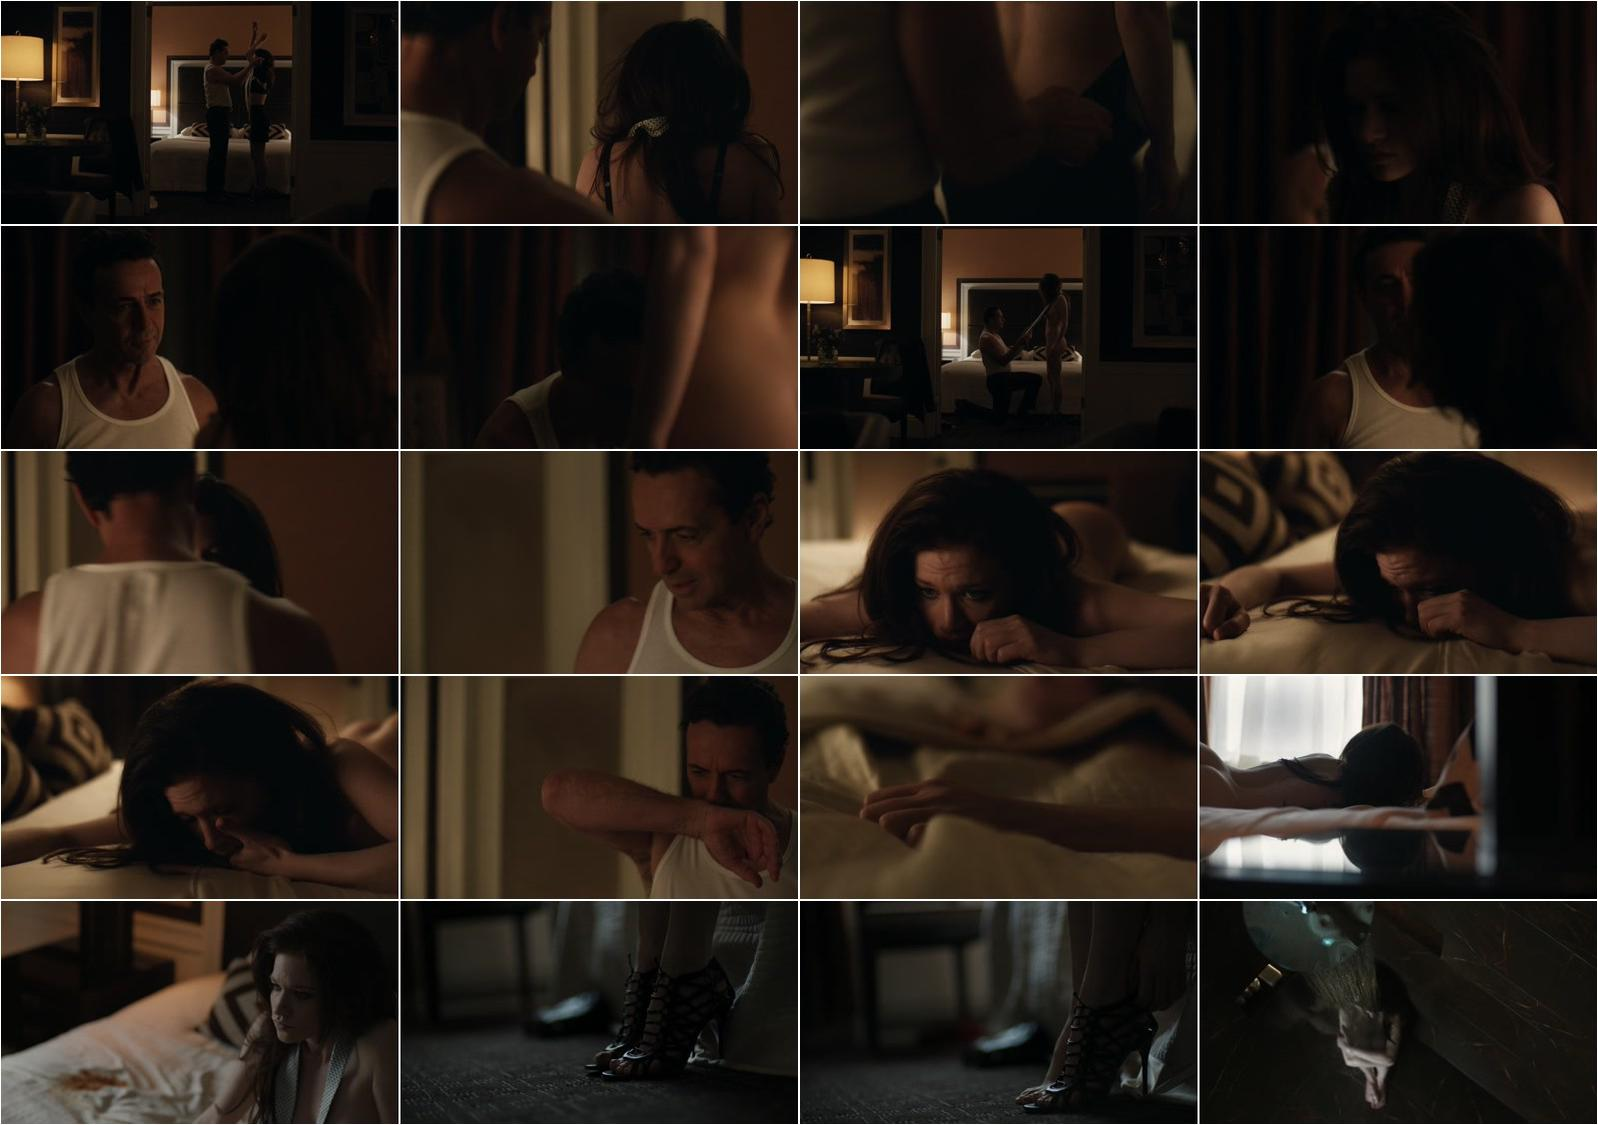 Sarah Hay nude - Flesh and Bone s01e02 (2015)